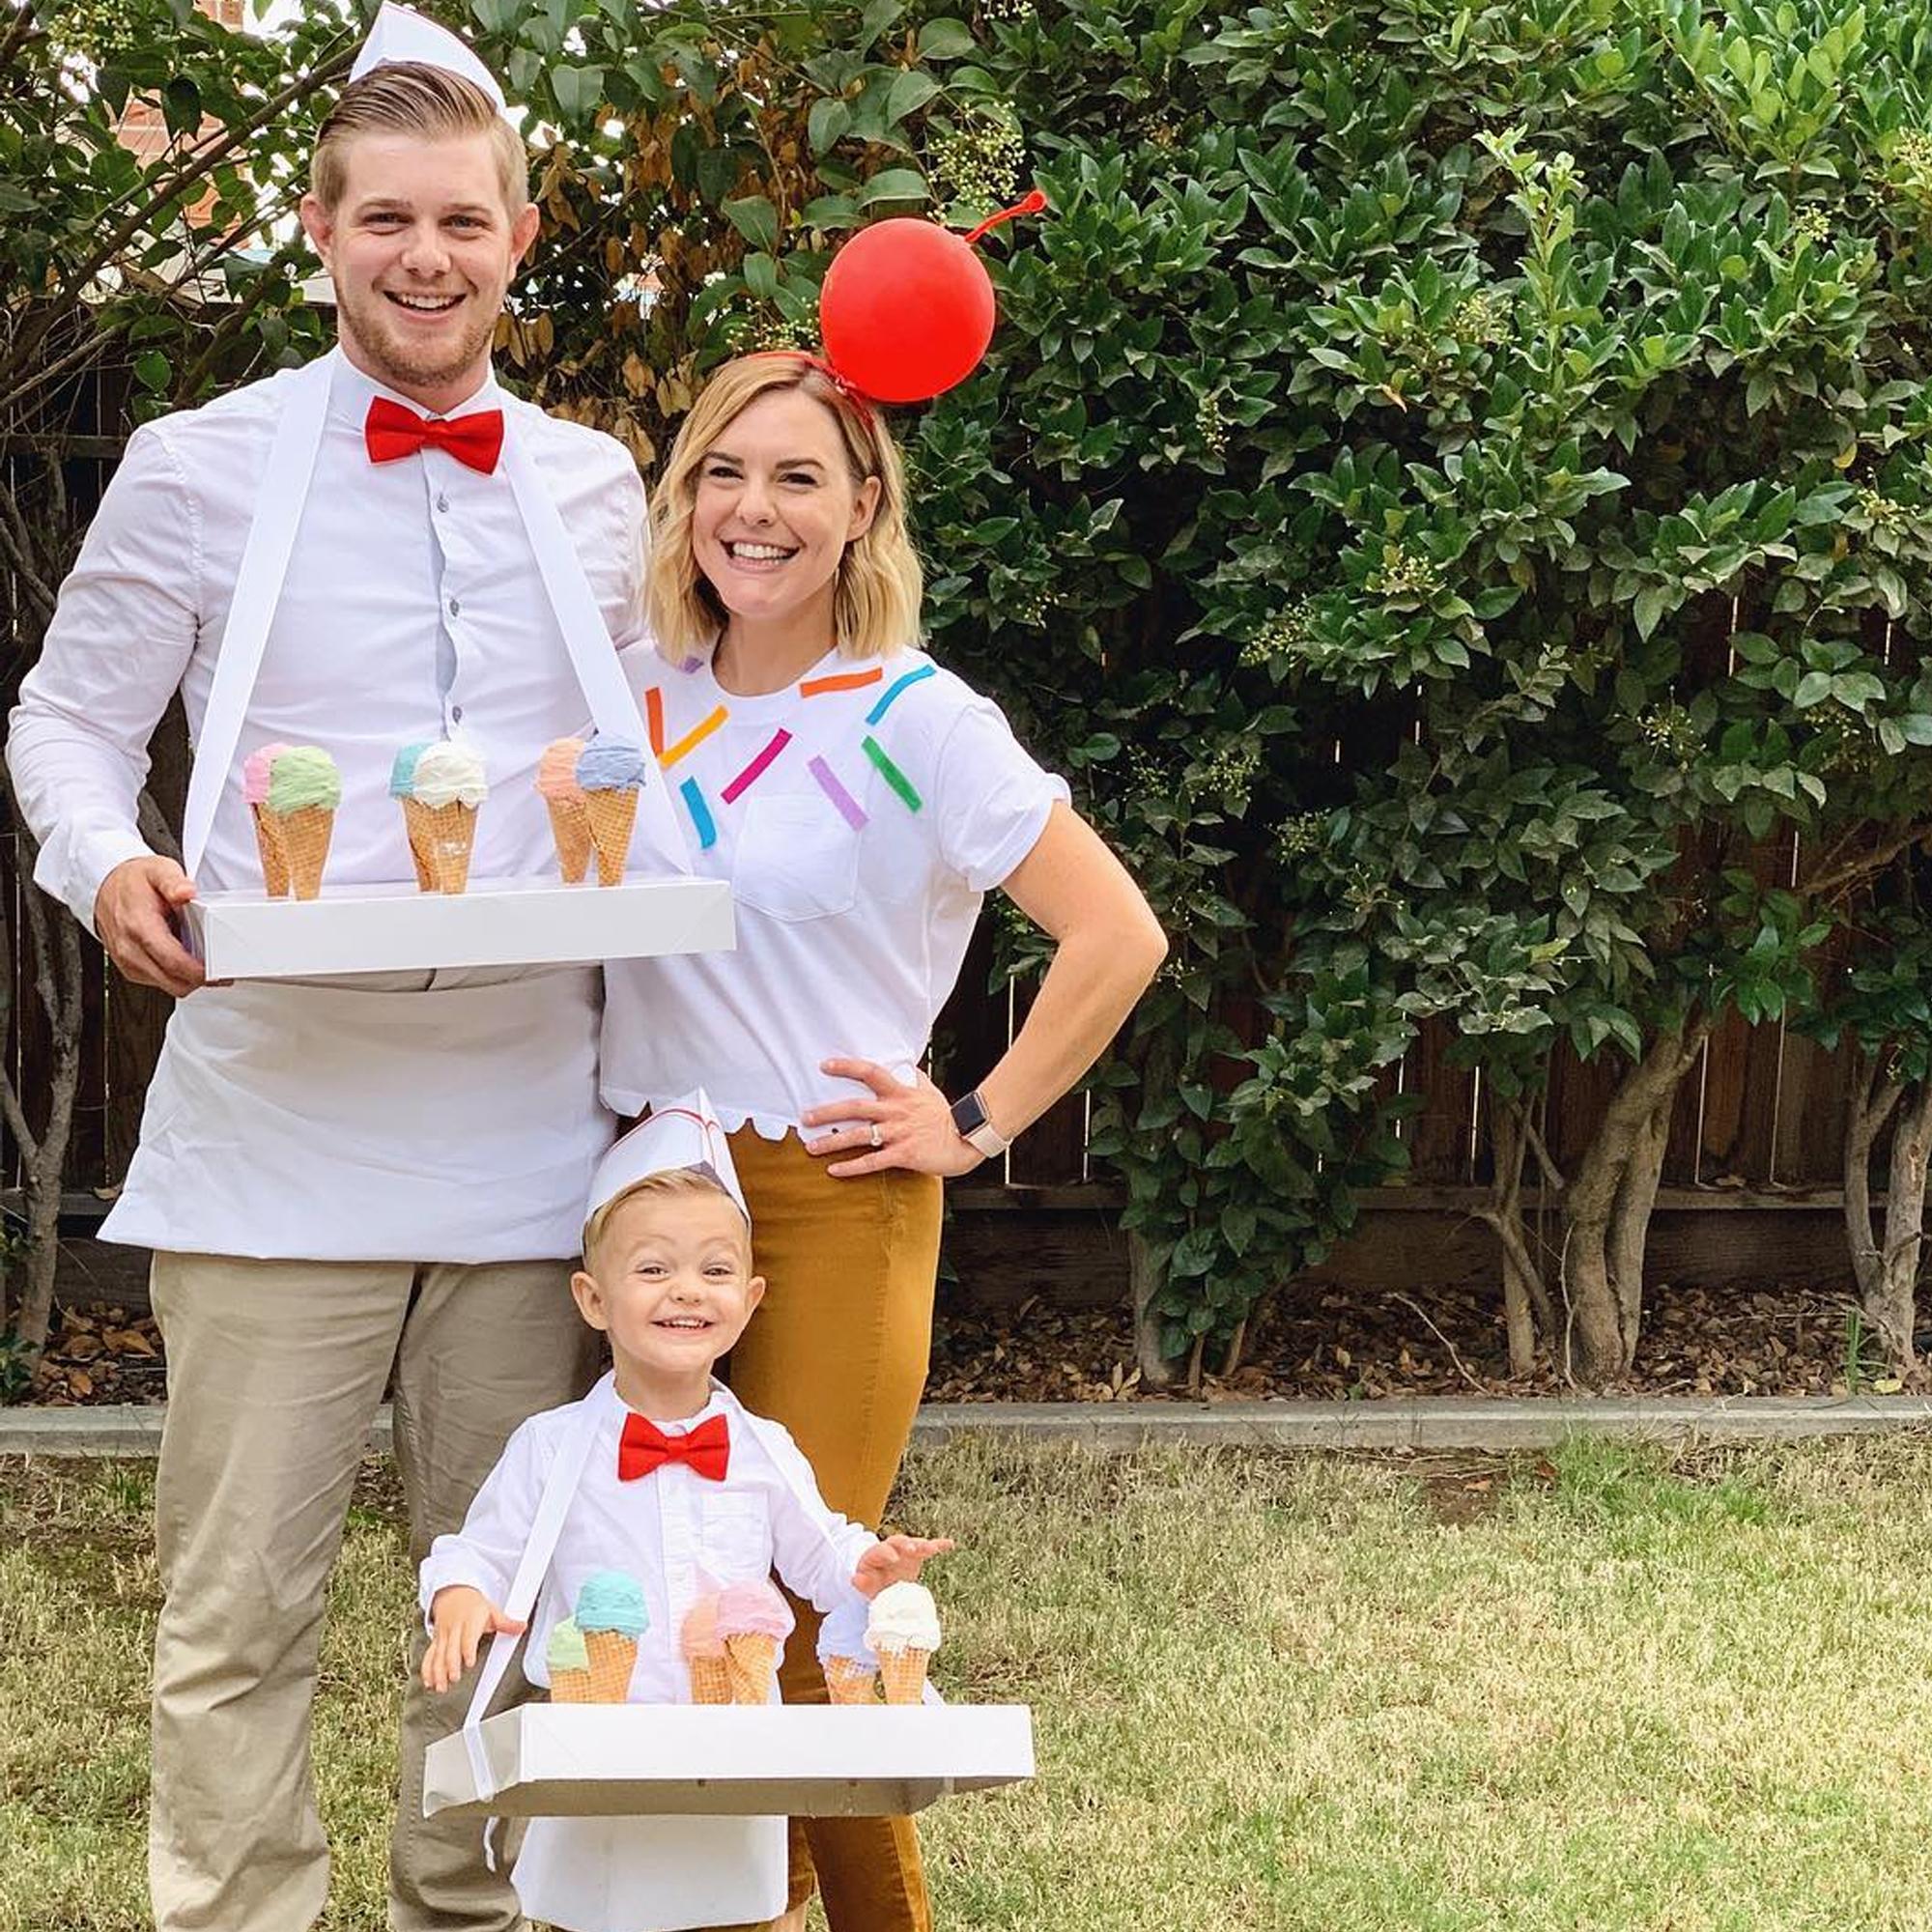 Jon Yetter Family Halloween Costume